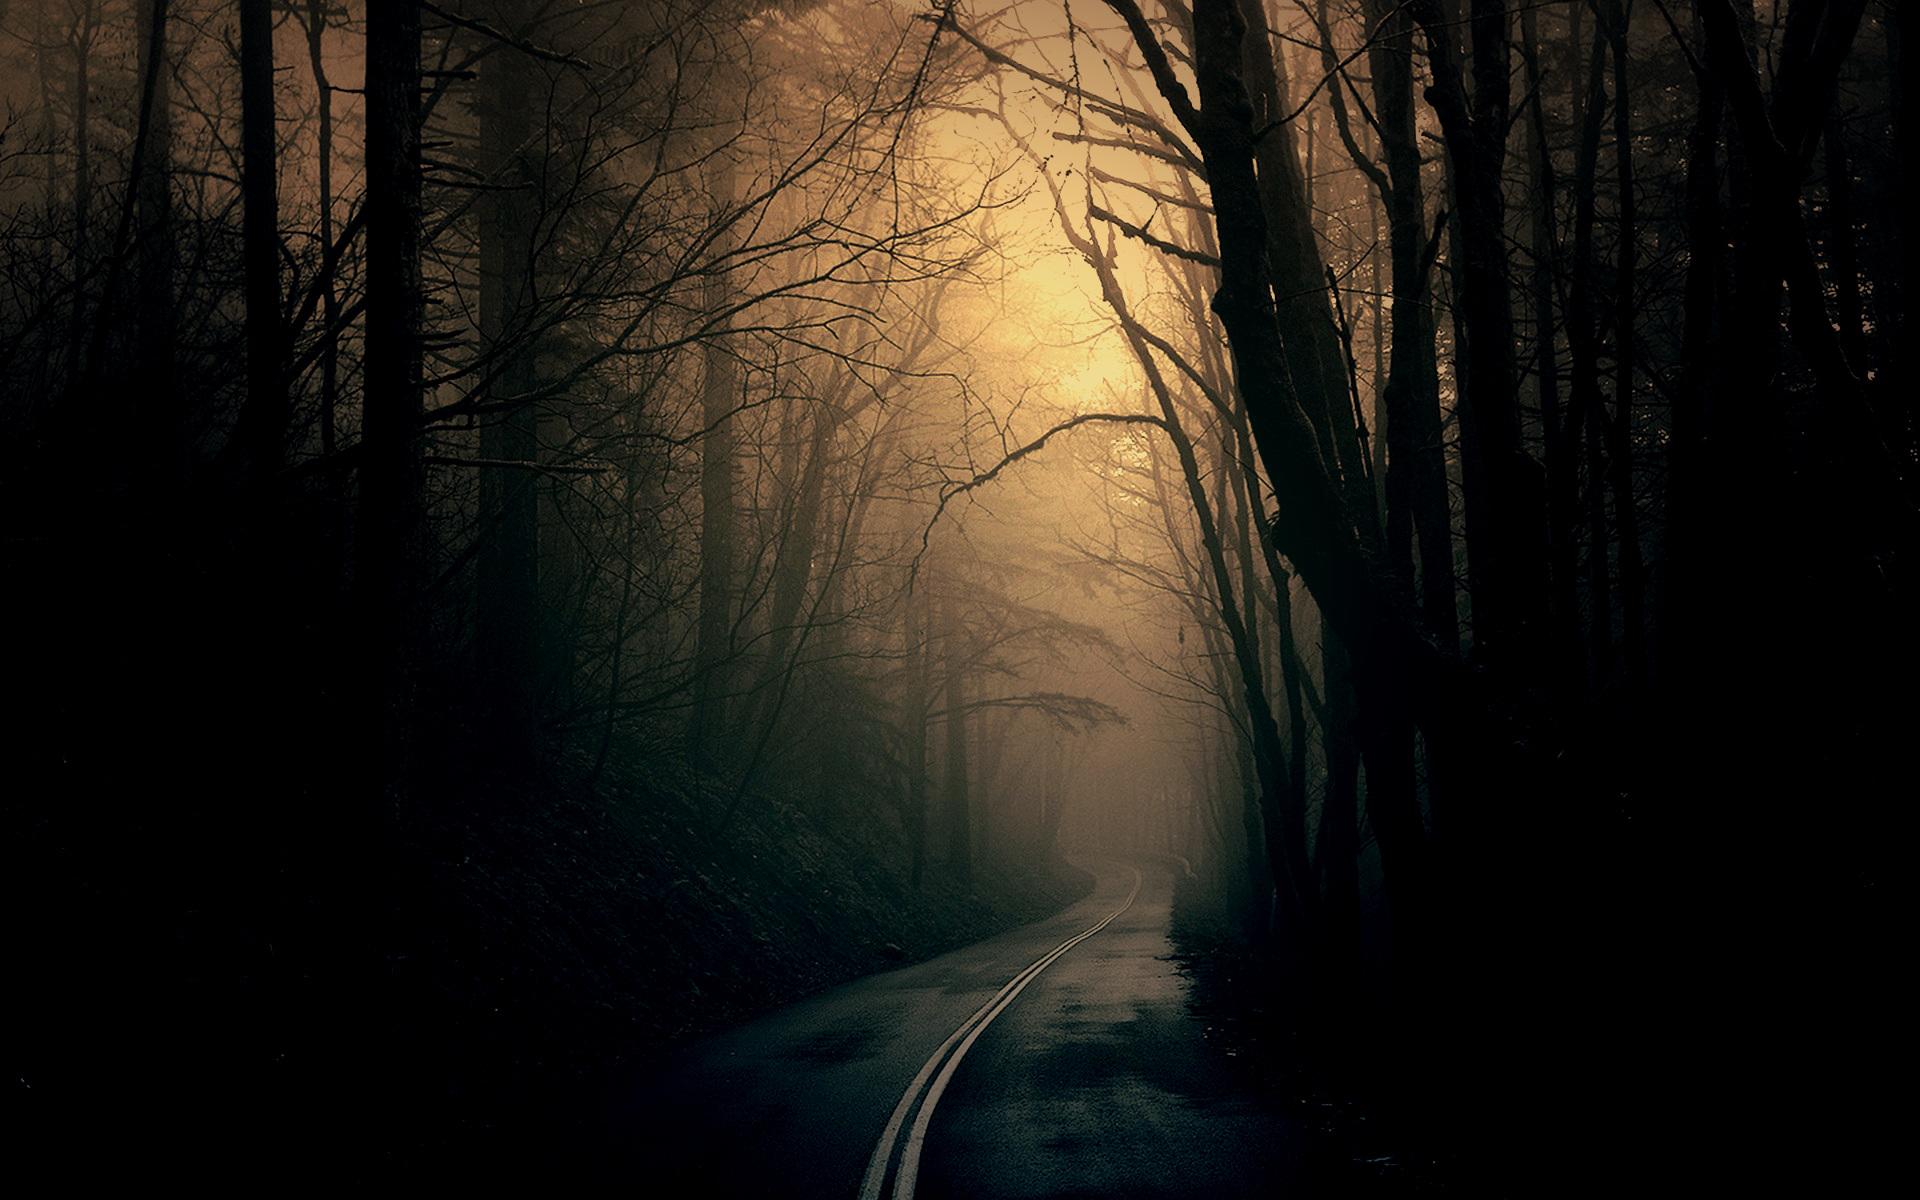 Hd wallpaper themes - Theme Bin Blog Archive Dark Forest Road Hd Wallpaper